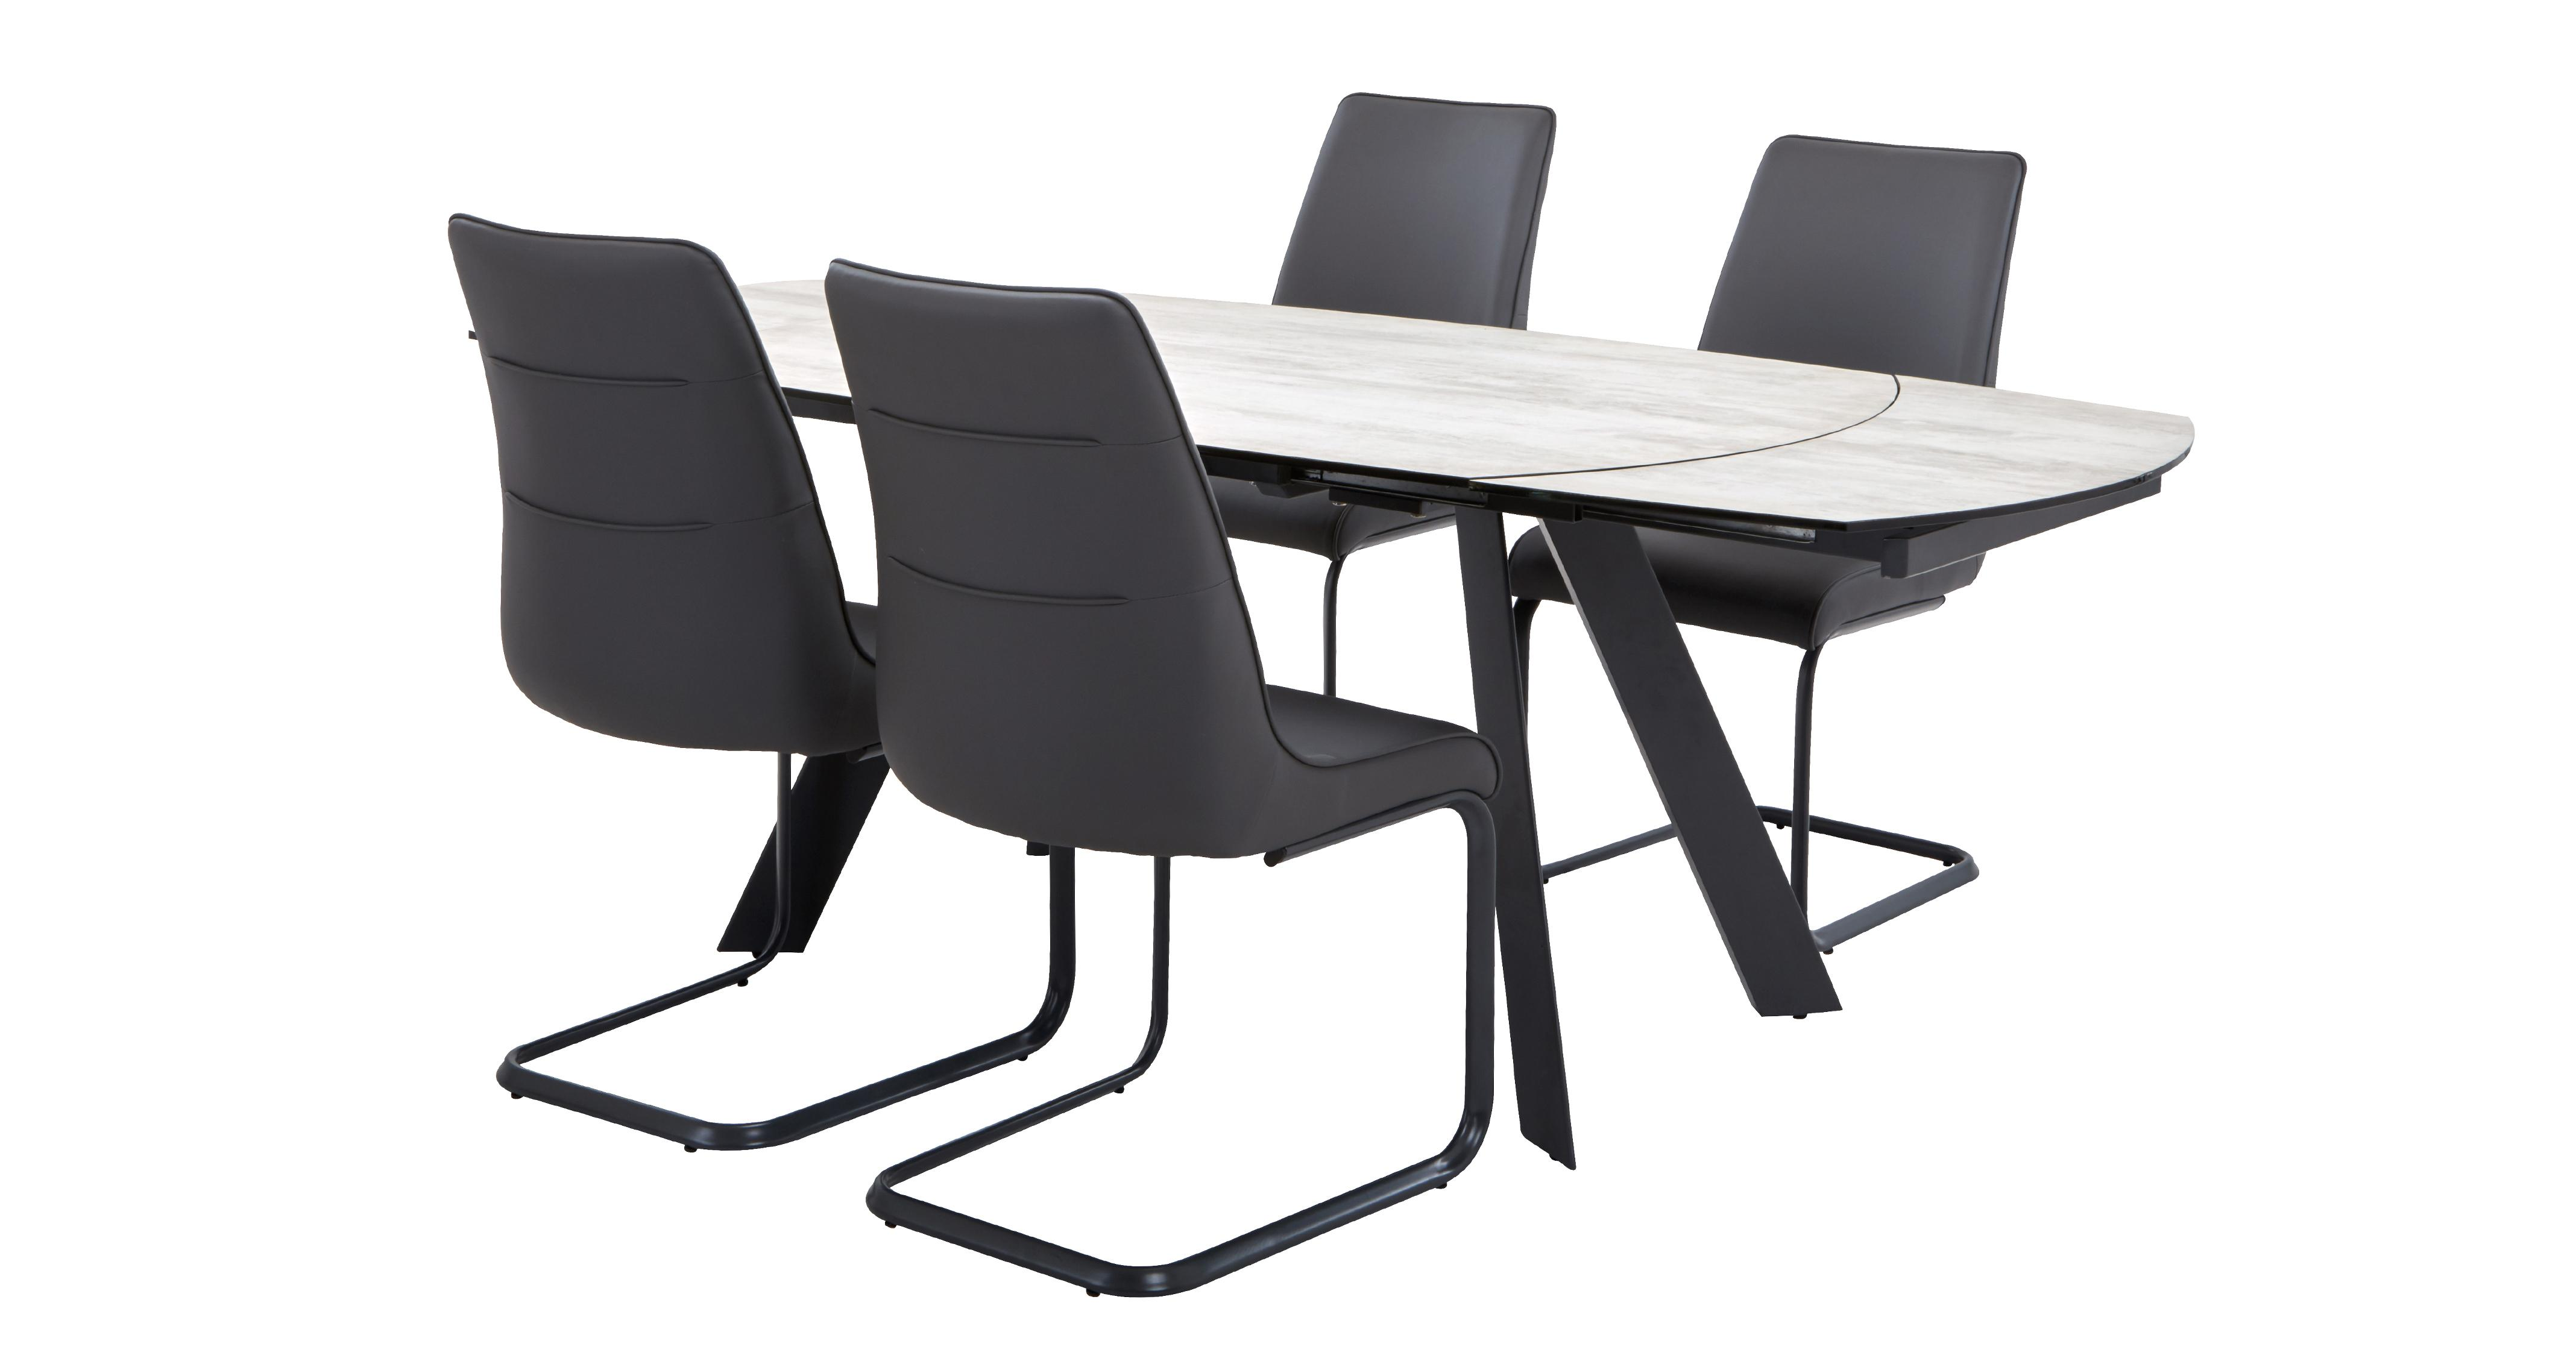 Dorada Extending Dining Table & Set of 4 Chairs | DFS Ireland